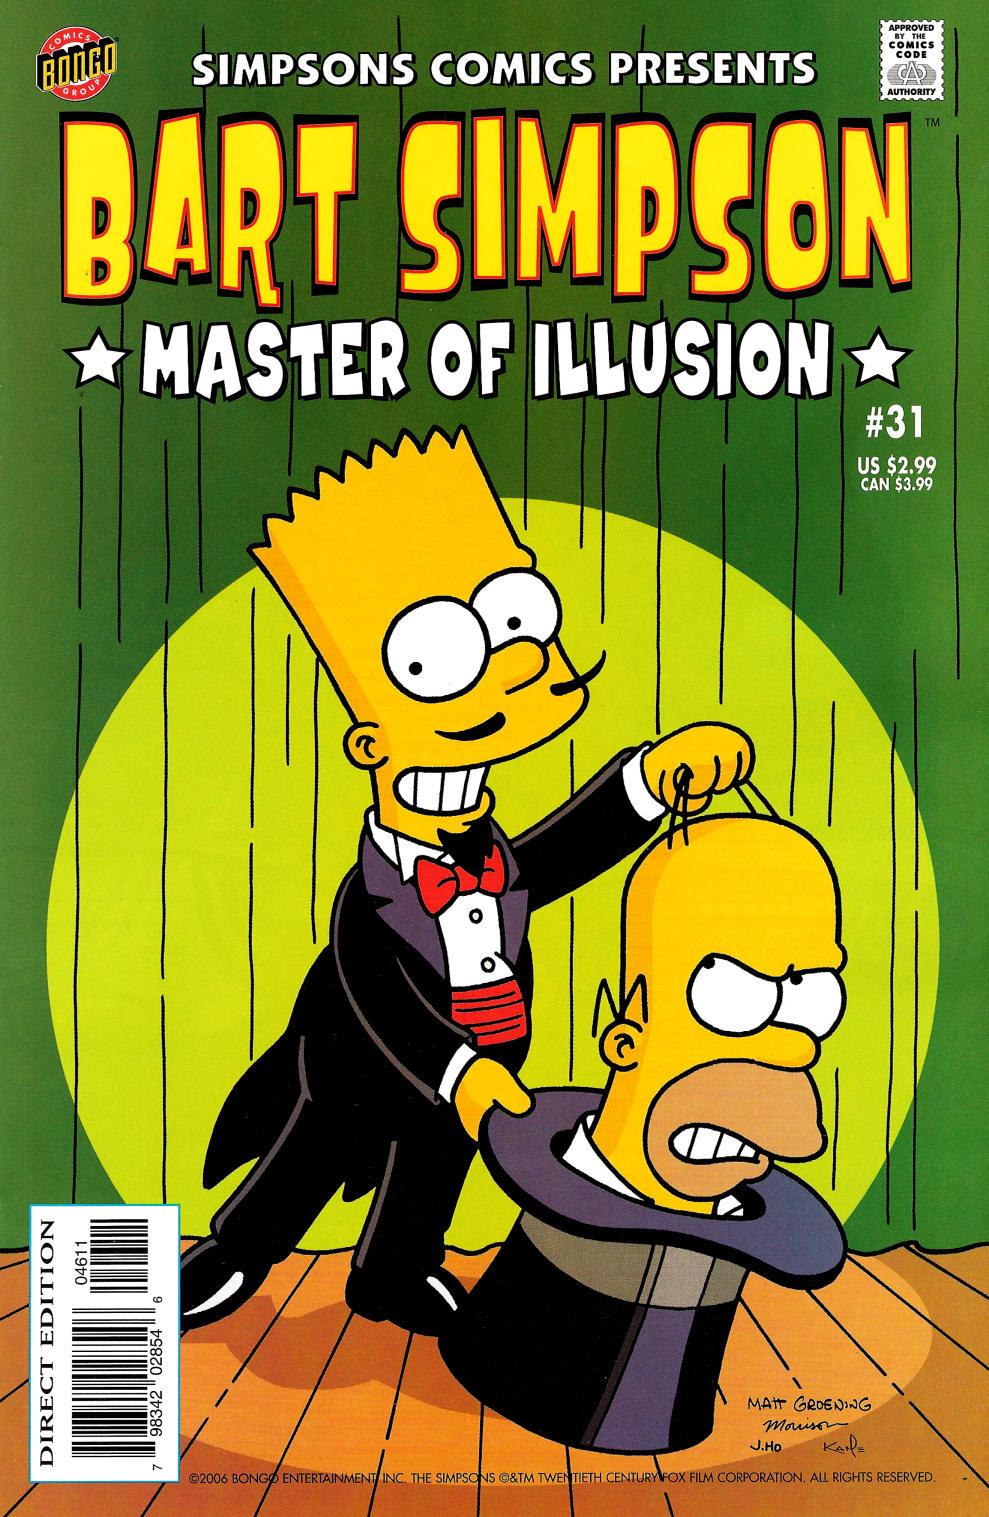 Read online Simpsons Comics Presents Bart Simpson comic -  Issue #31 - 1